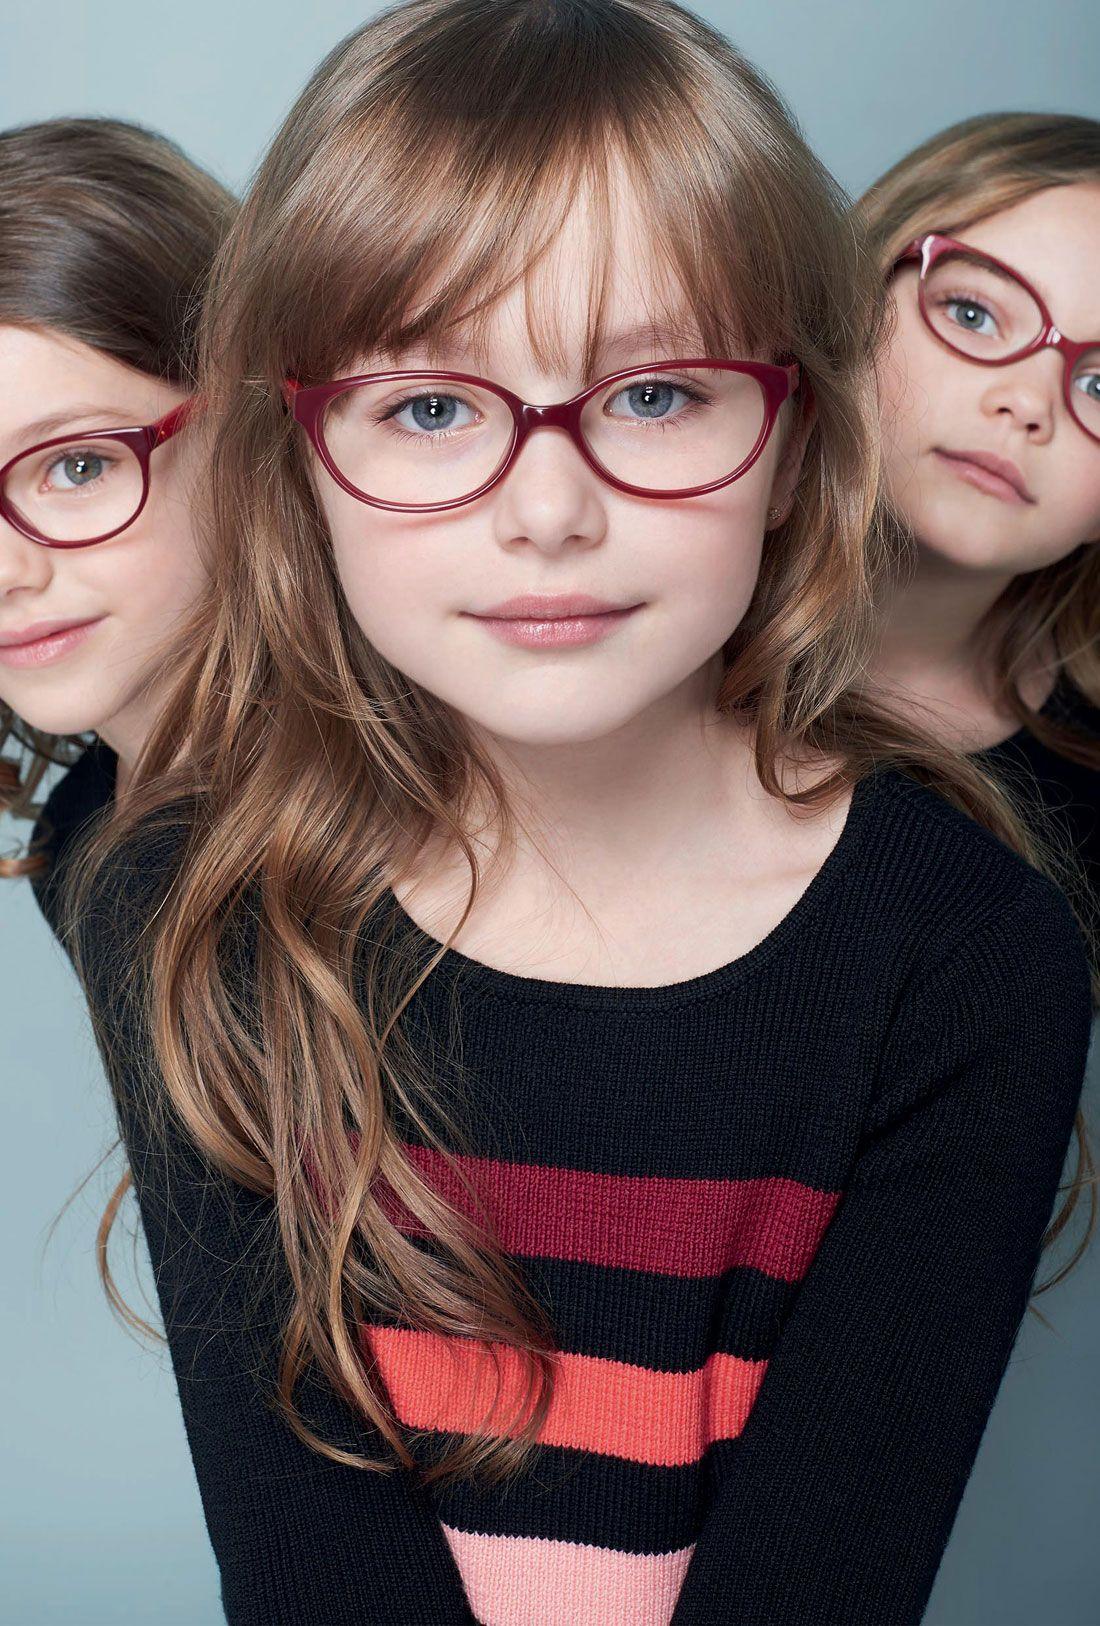 LES BY SONIA RYKIEL fashion for girls Kids